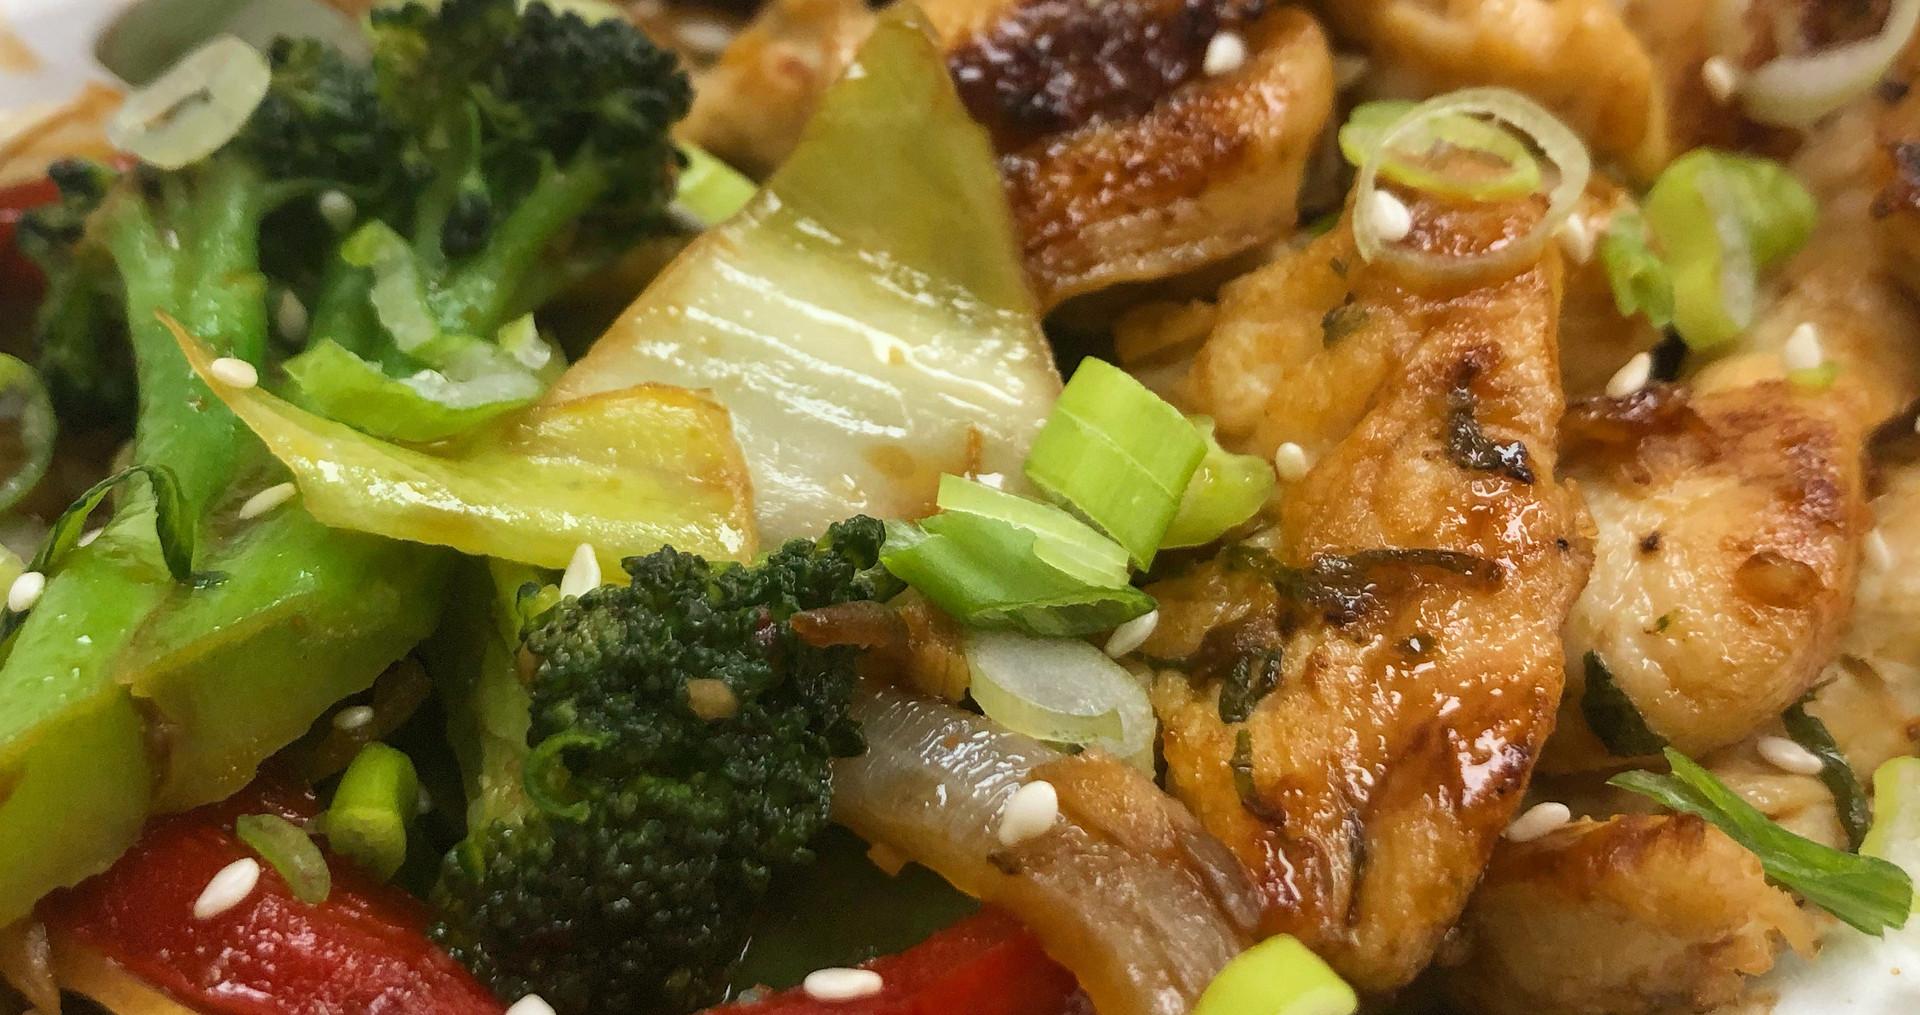 Sweet & Spicy Garden Stir Fry with White Rice